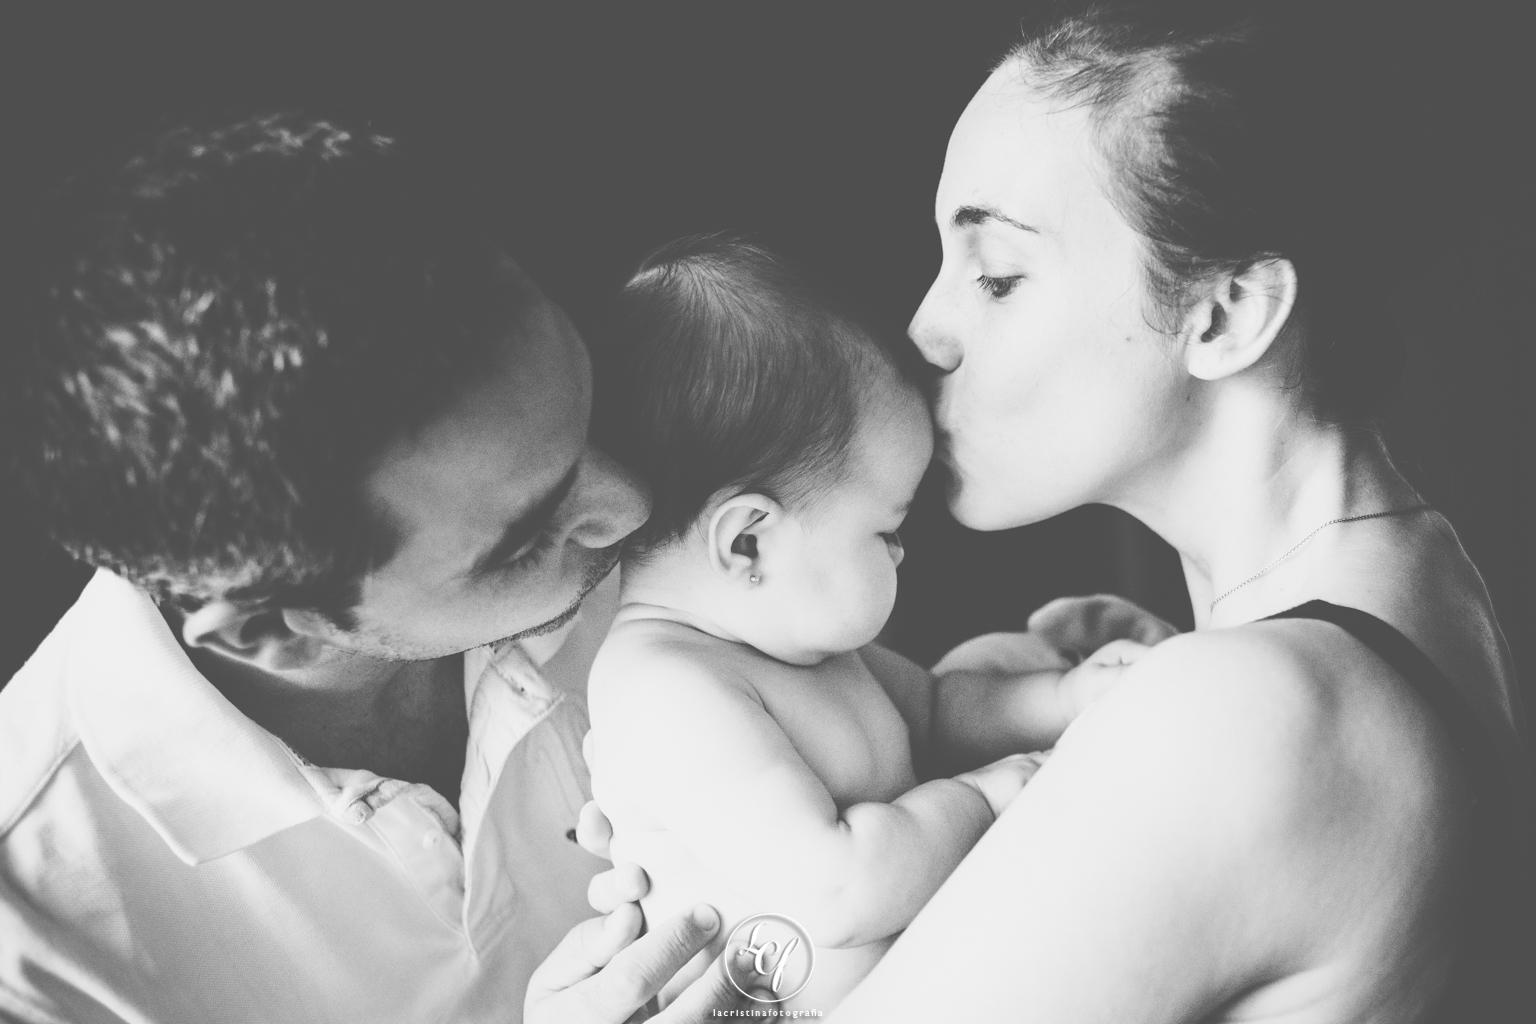 fotógrafo de bebé :: fotógrafo de recién nacido :: fotógrafo de bebé sant cugat :: fotógrafo de bebé Barcelona :: fotografía familiar